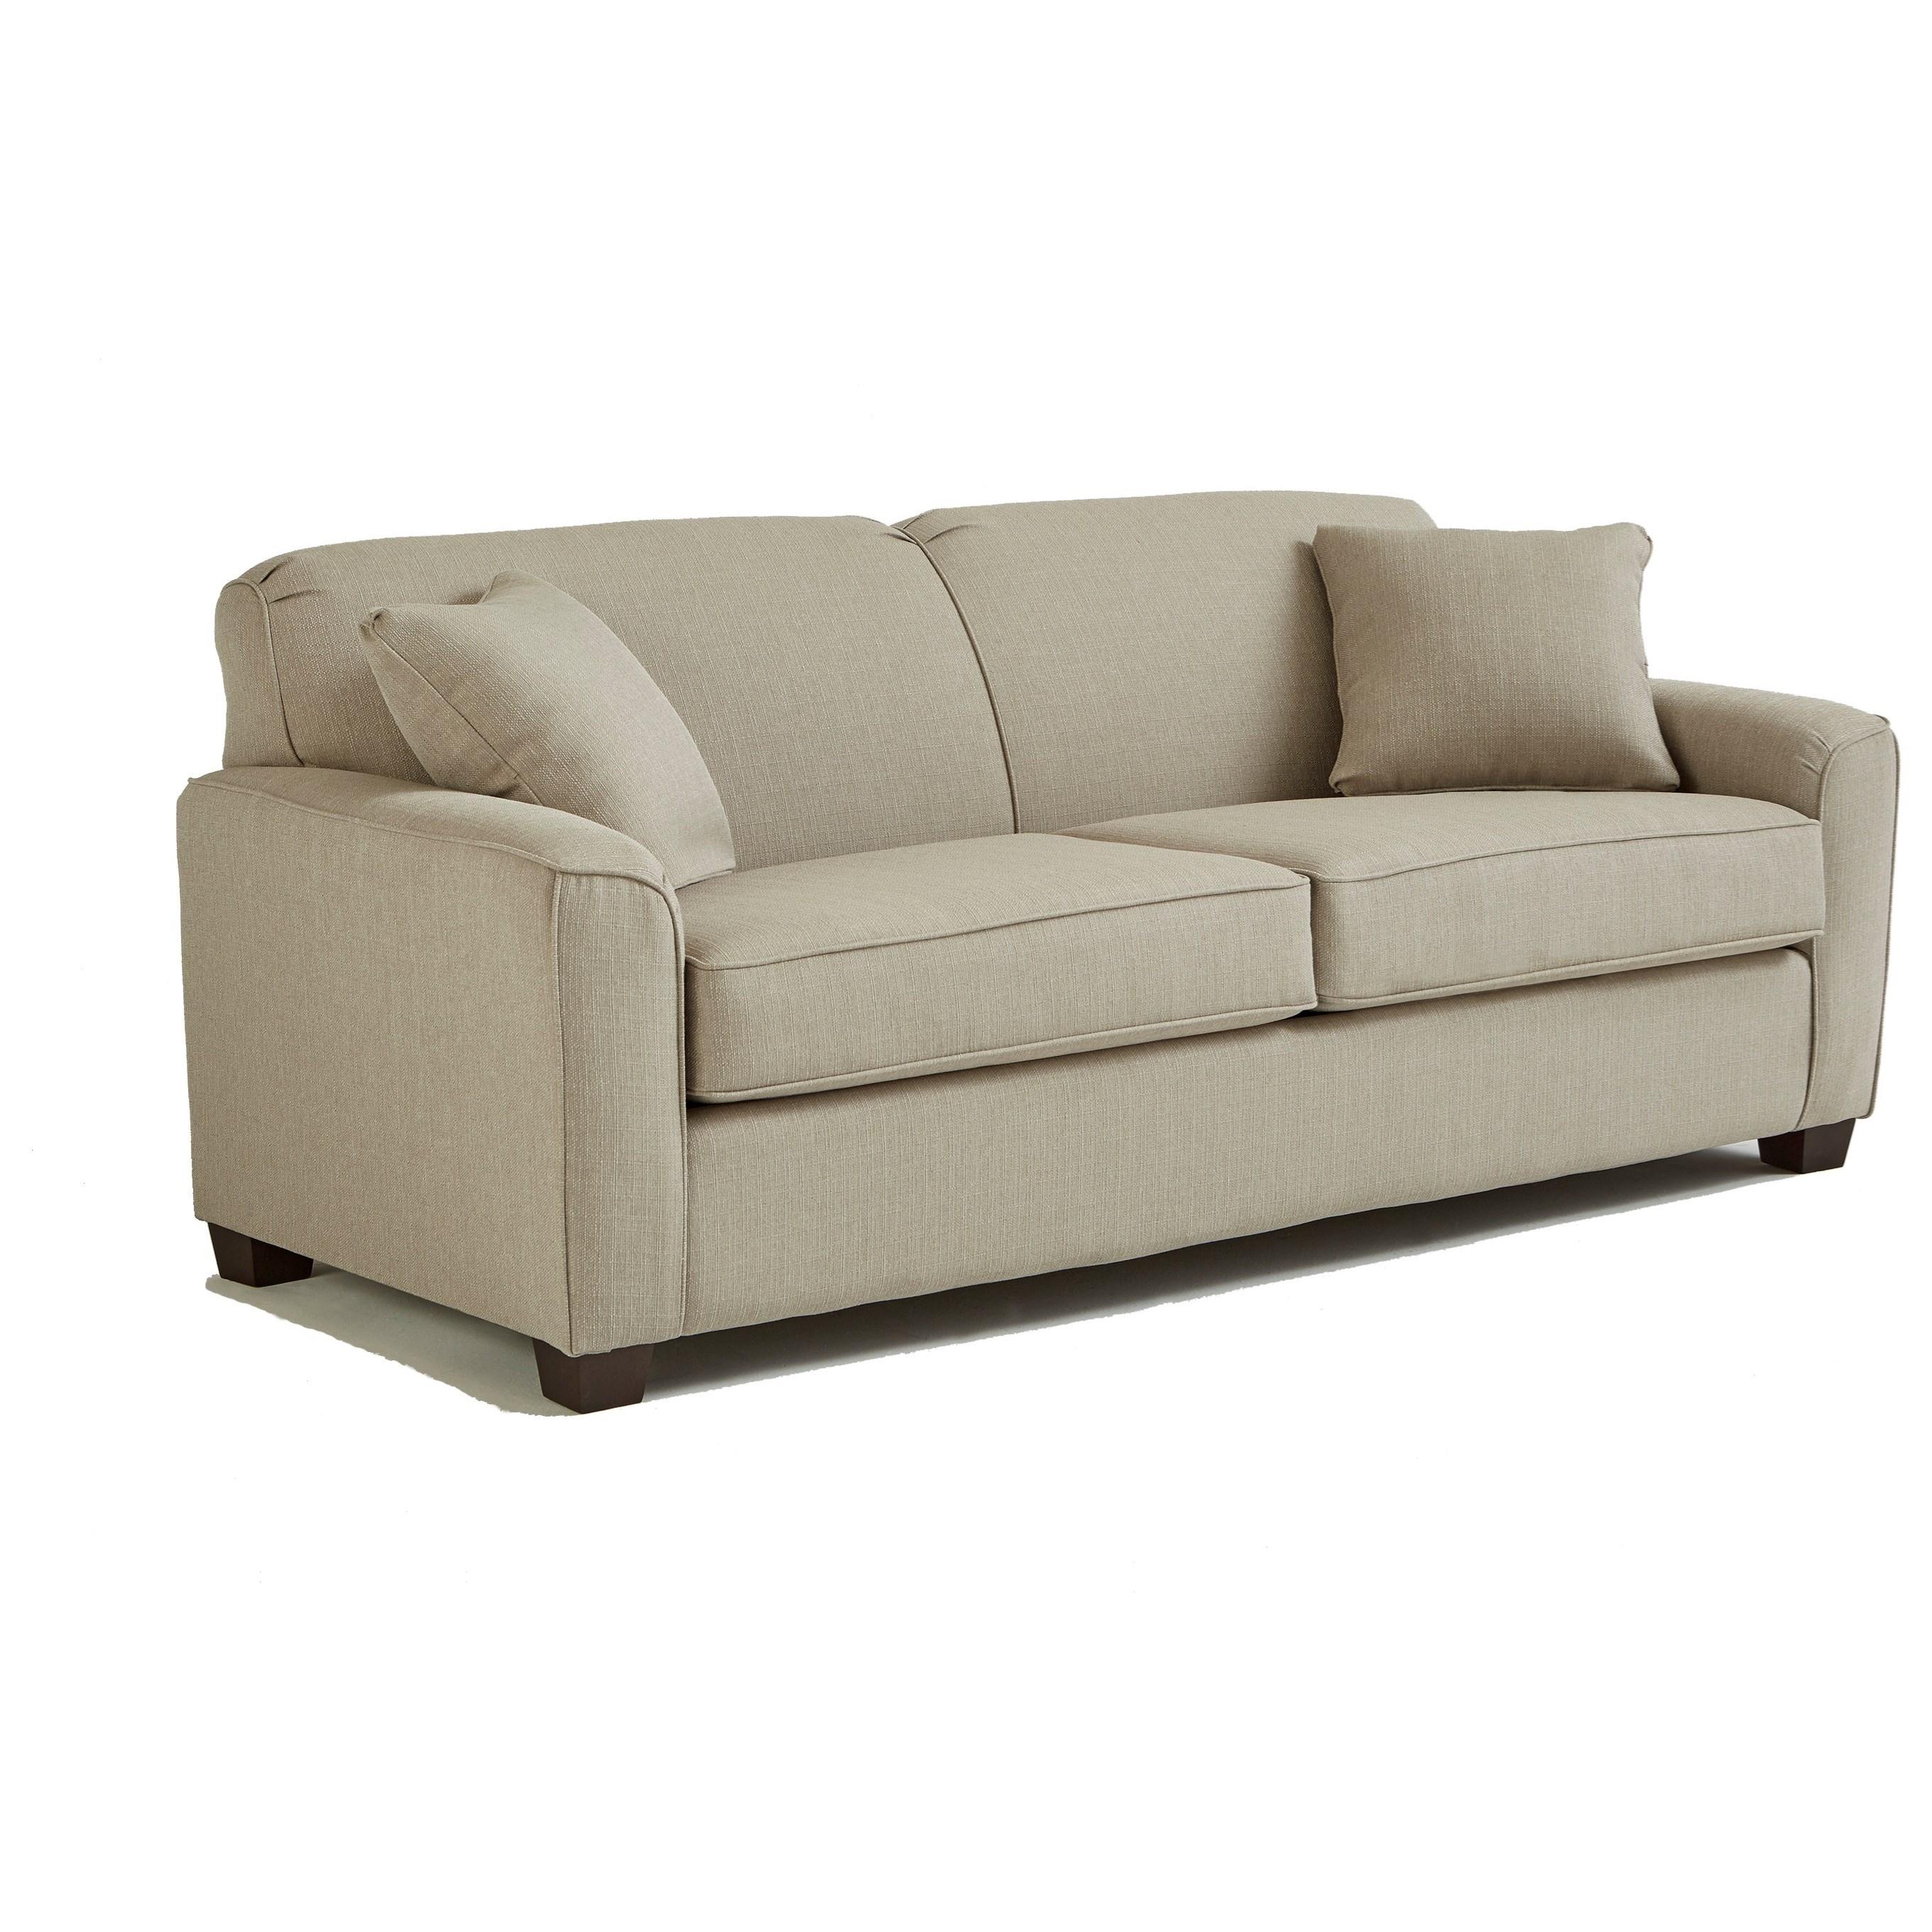 dream sofa bed 3 seater white air sleeper broyhill living room monica queen